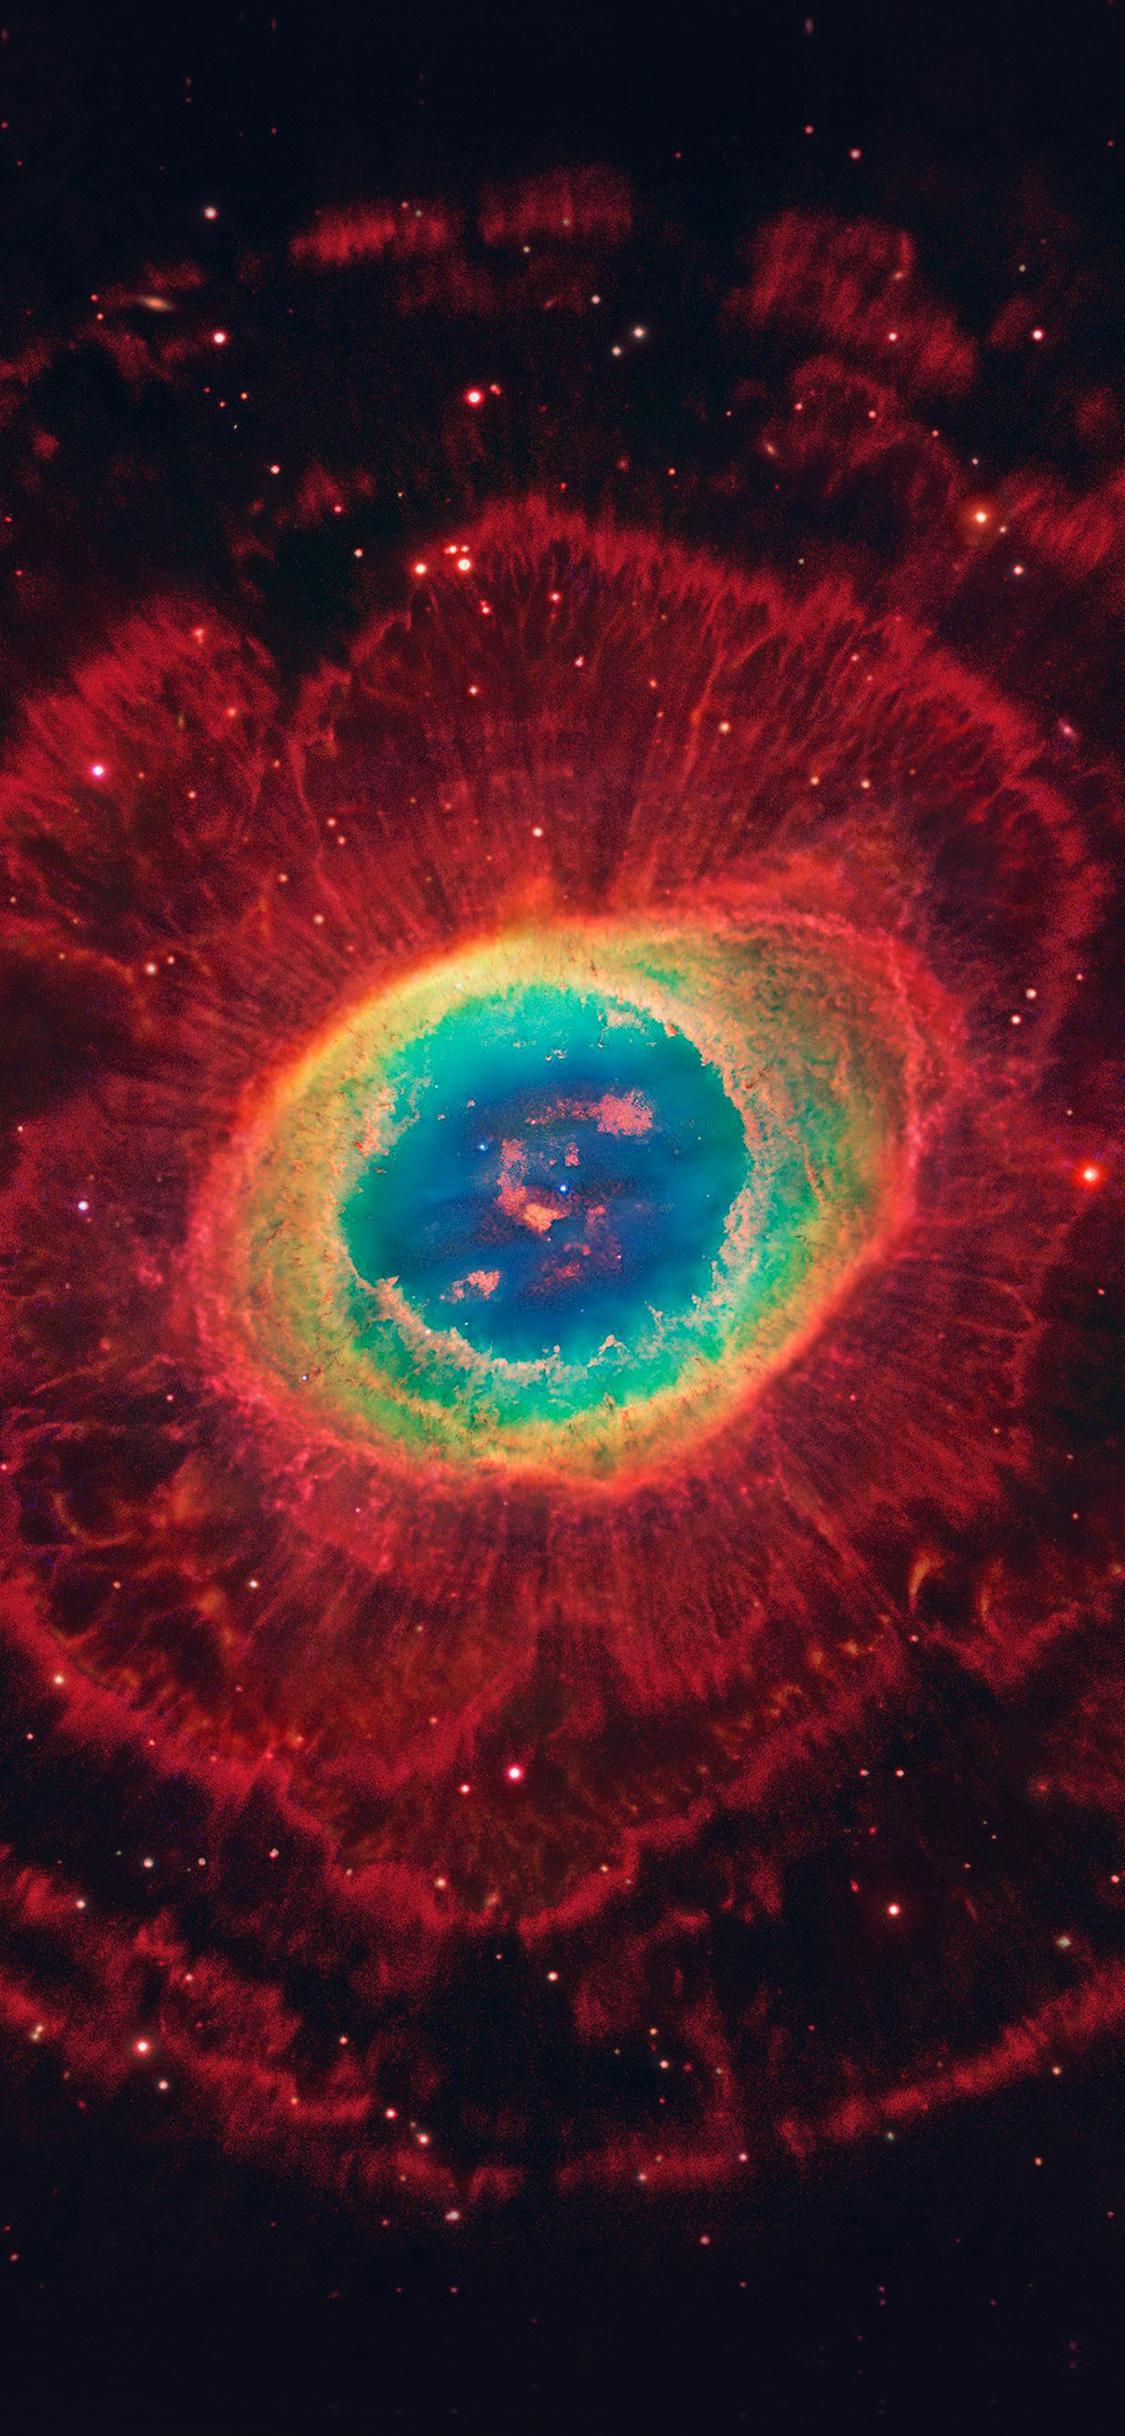 iPhonexpapers.com-Apple-iPhone-wallpaper-mt64-space-aurora-nebula-star-red-dark-night